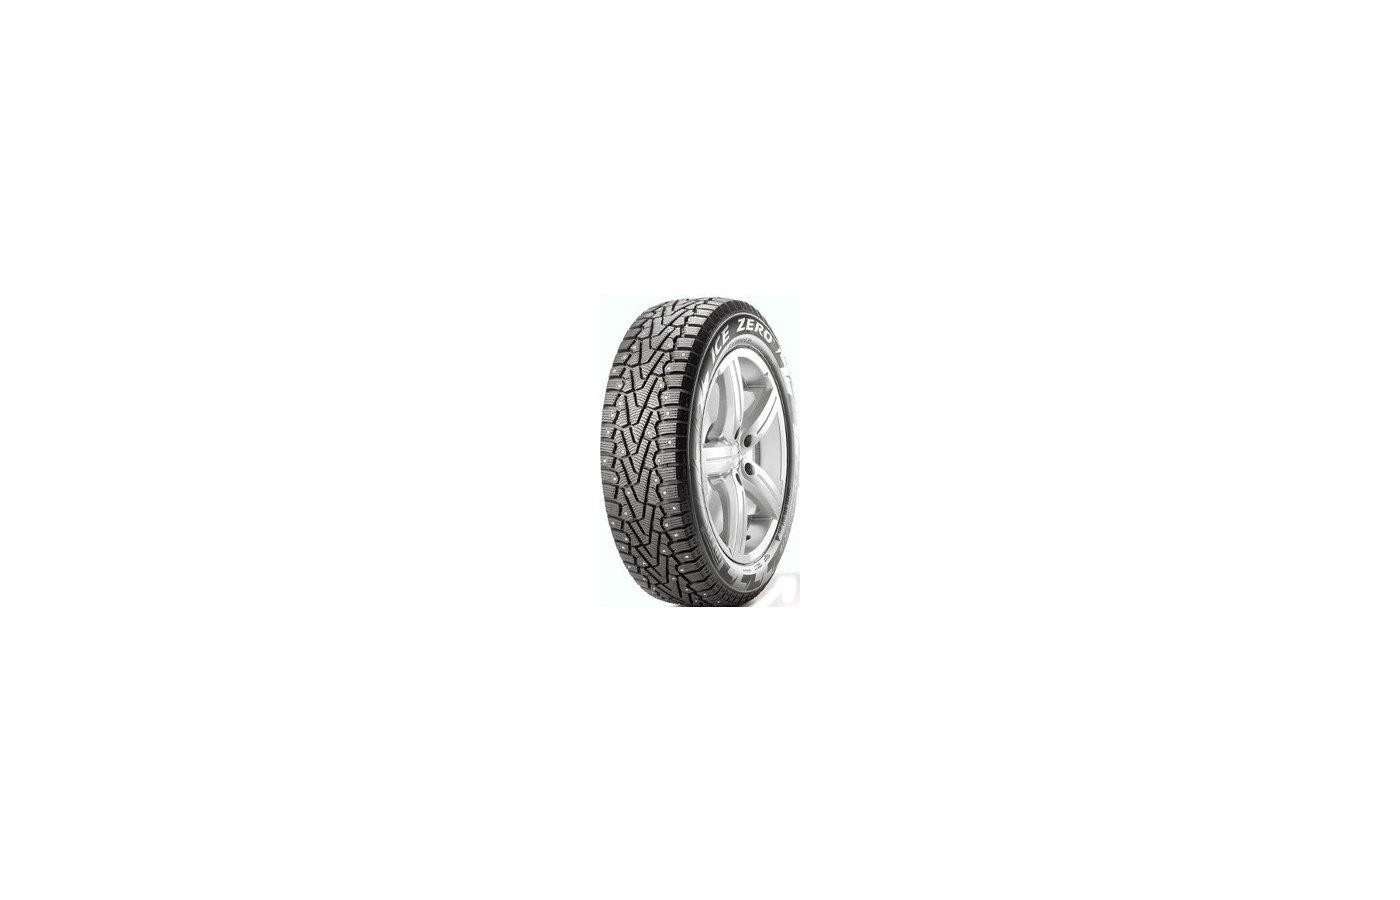 Шина Pirelli Winter Ice Zero 235/50 R18 TL 101T XL шип